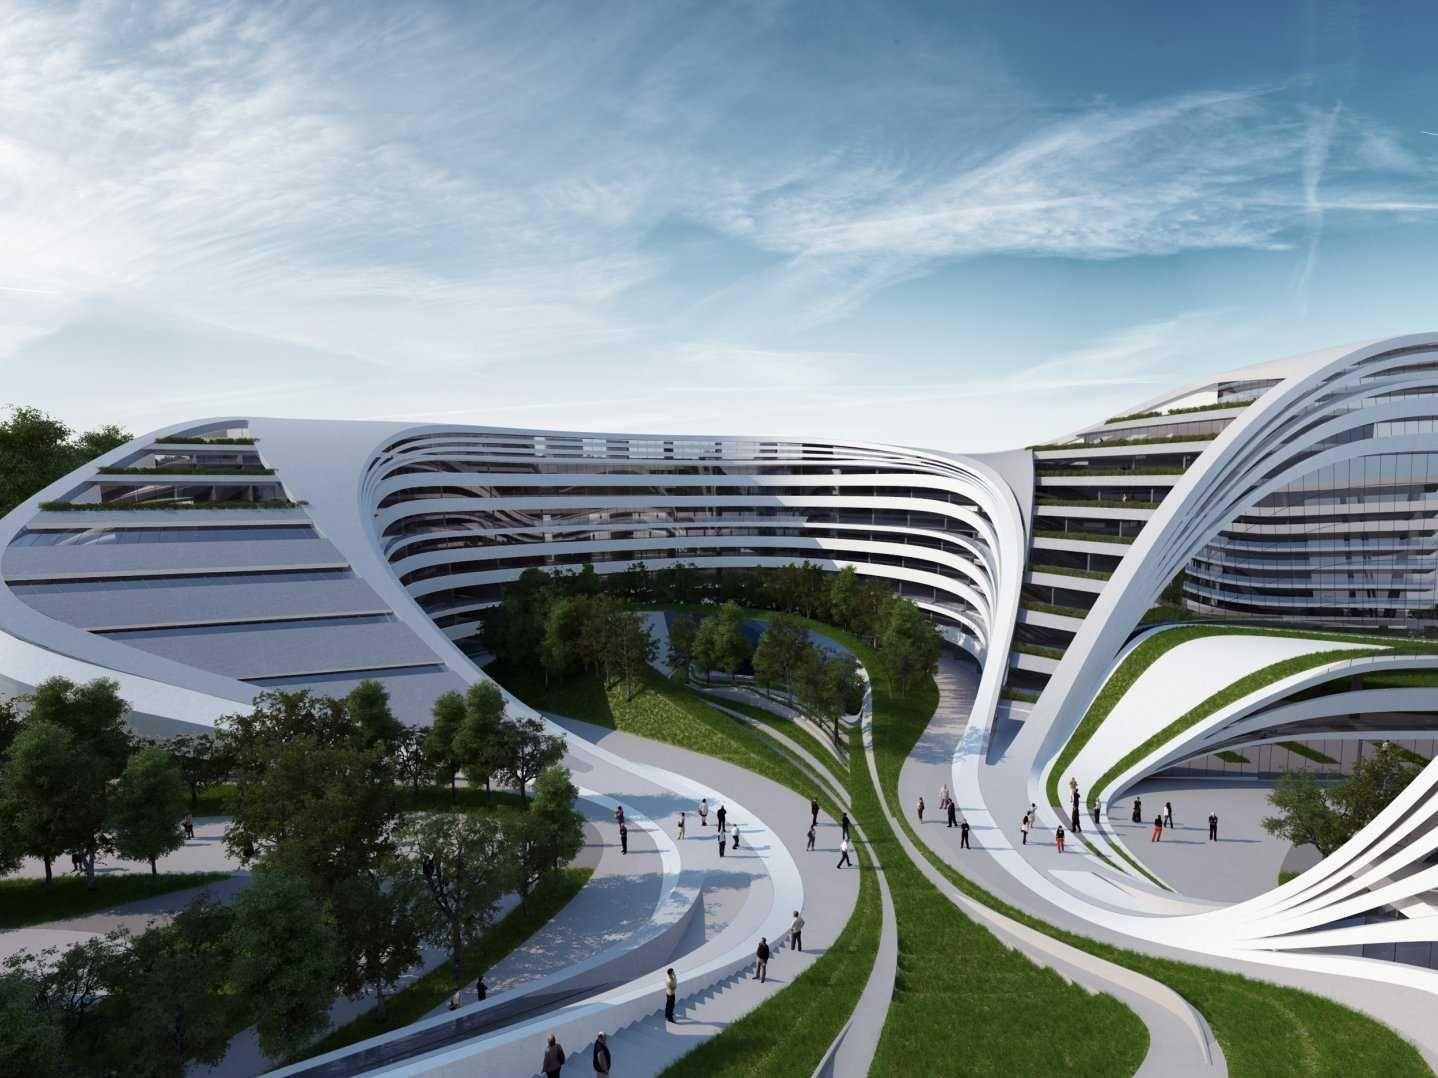 Best Zaha Hadid Images On Pinterest Zaha Hadid Architects